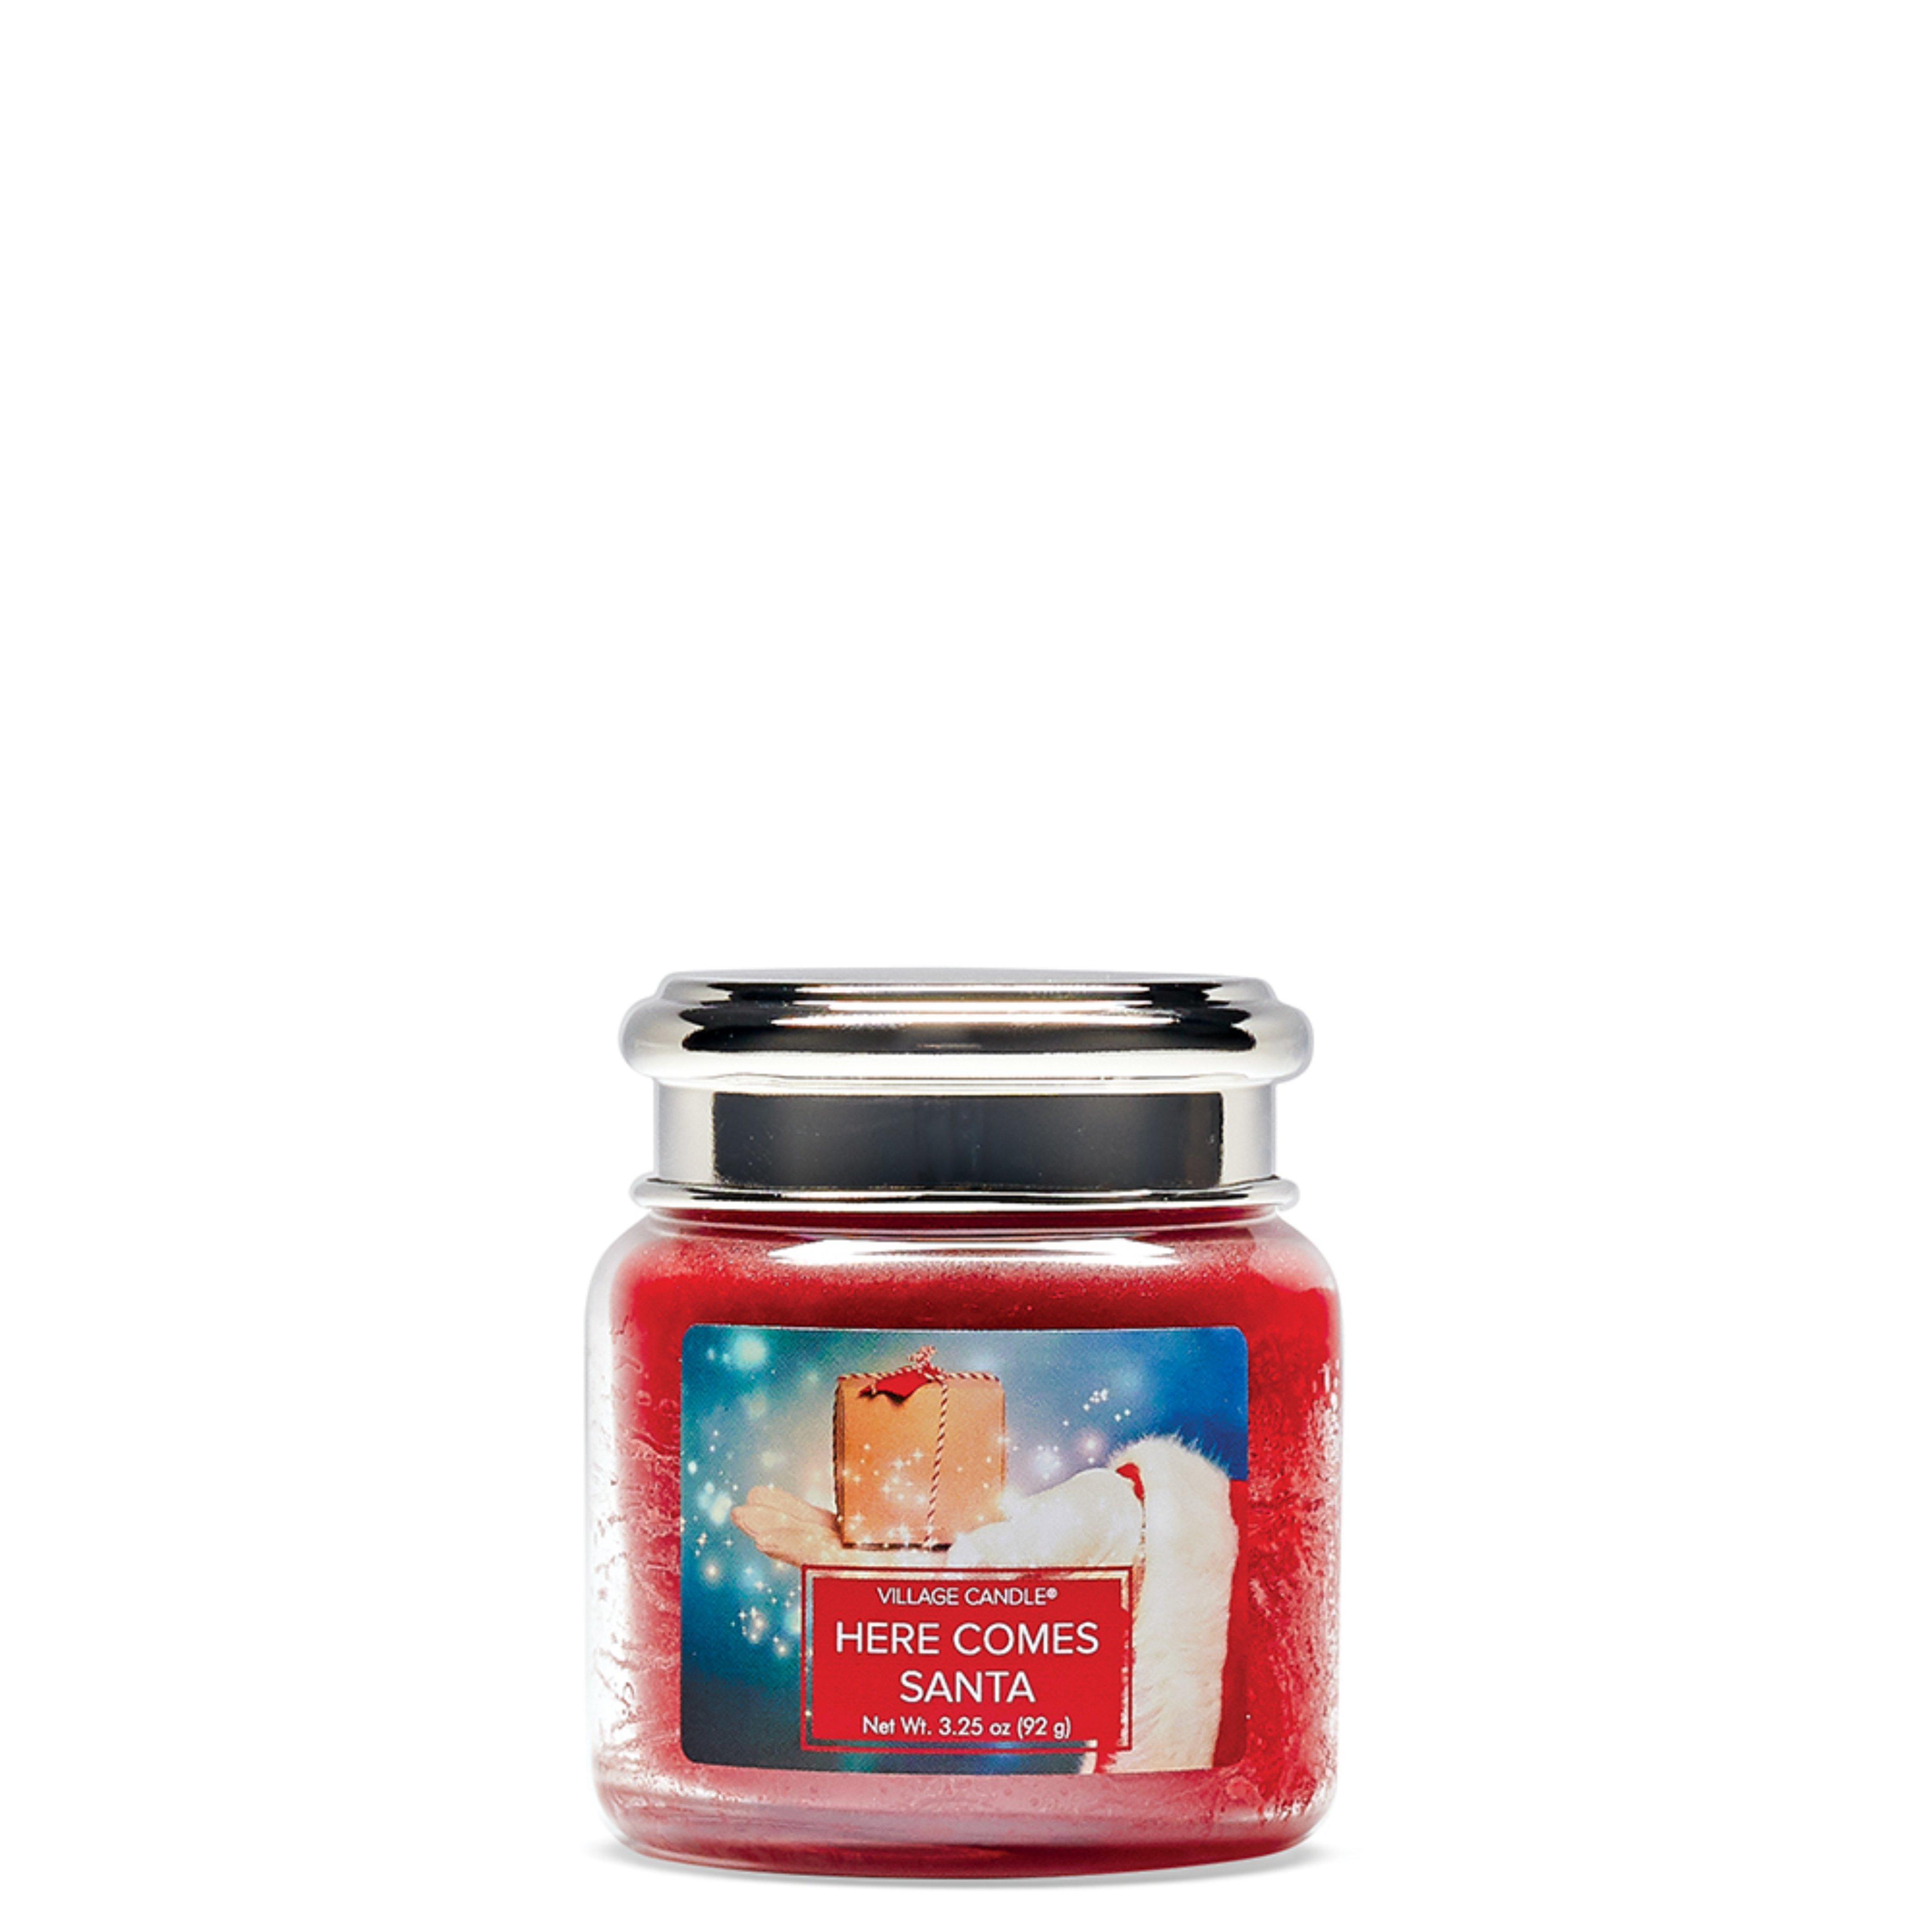 Tradition Jar Petite 92 g Here Comes Santa